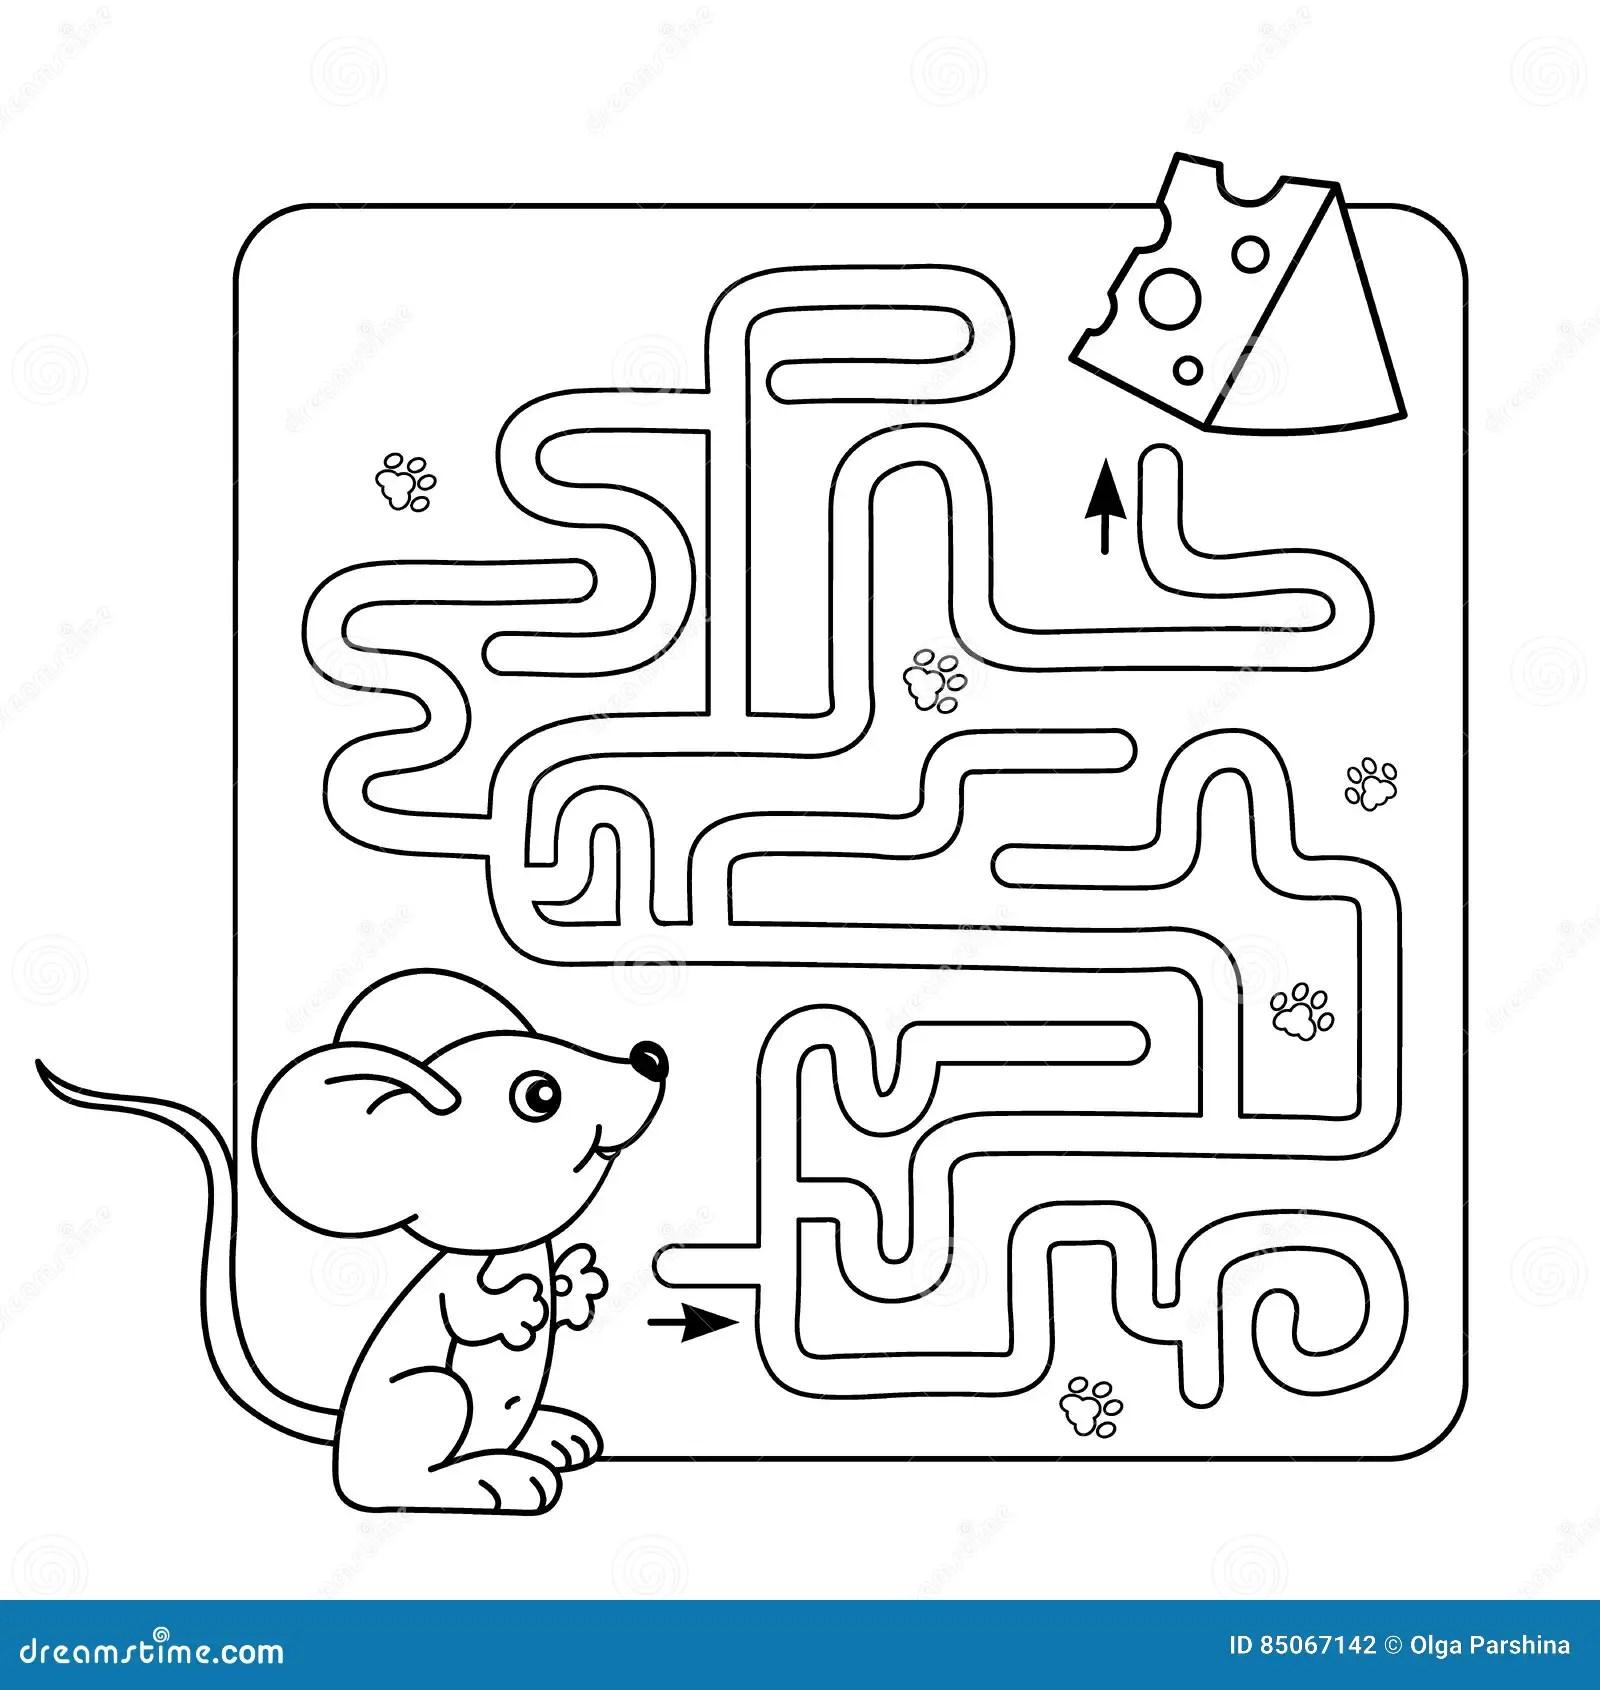 Labyrint Eller Labyrintlek For Forskole Barn Pussel Farga